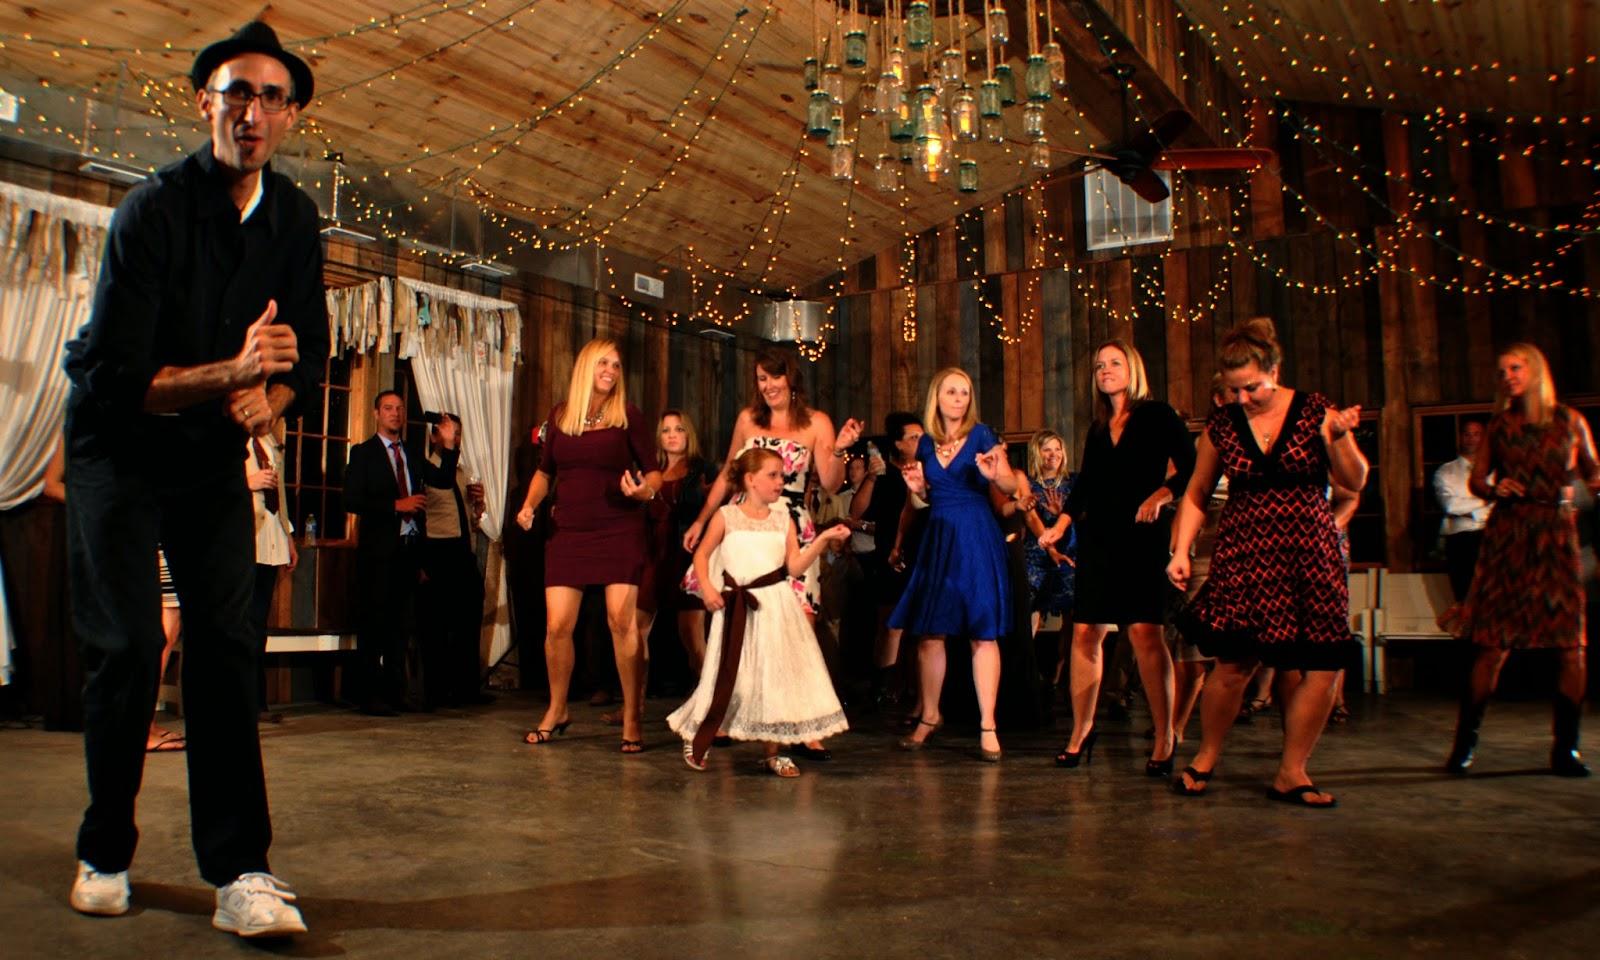 With Class LLC Wedding Coordinators, Wedding Planners, Wedding DJs, Party DJs, Chattanooga DJs, Cleveland DJs, Dalton DJs - High Point Farms - Flintstone, GA